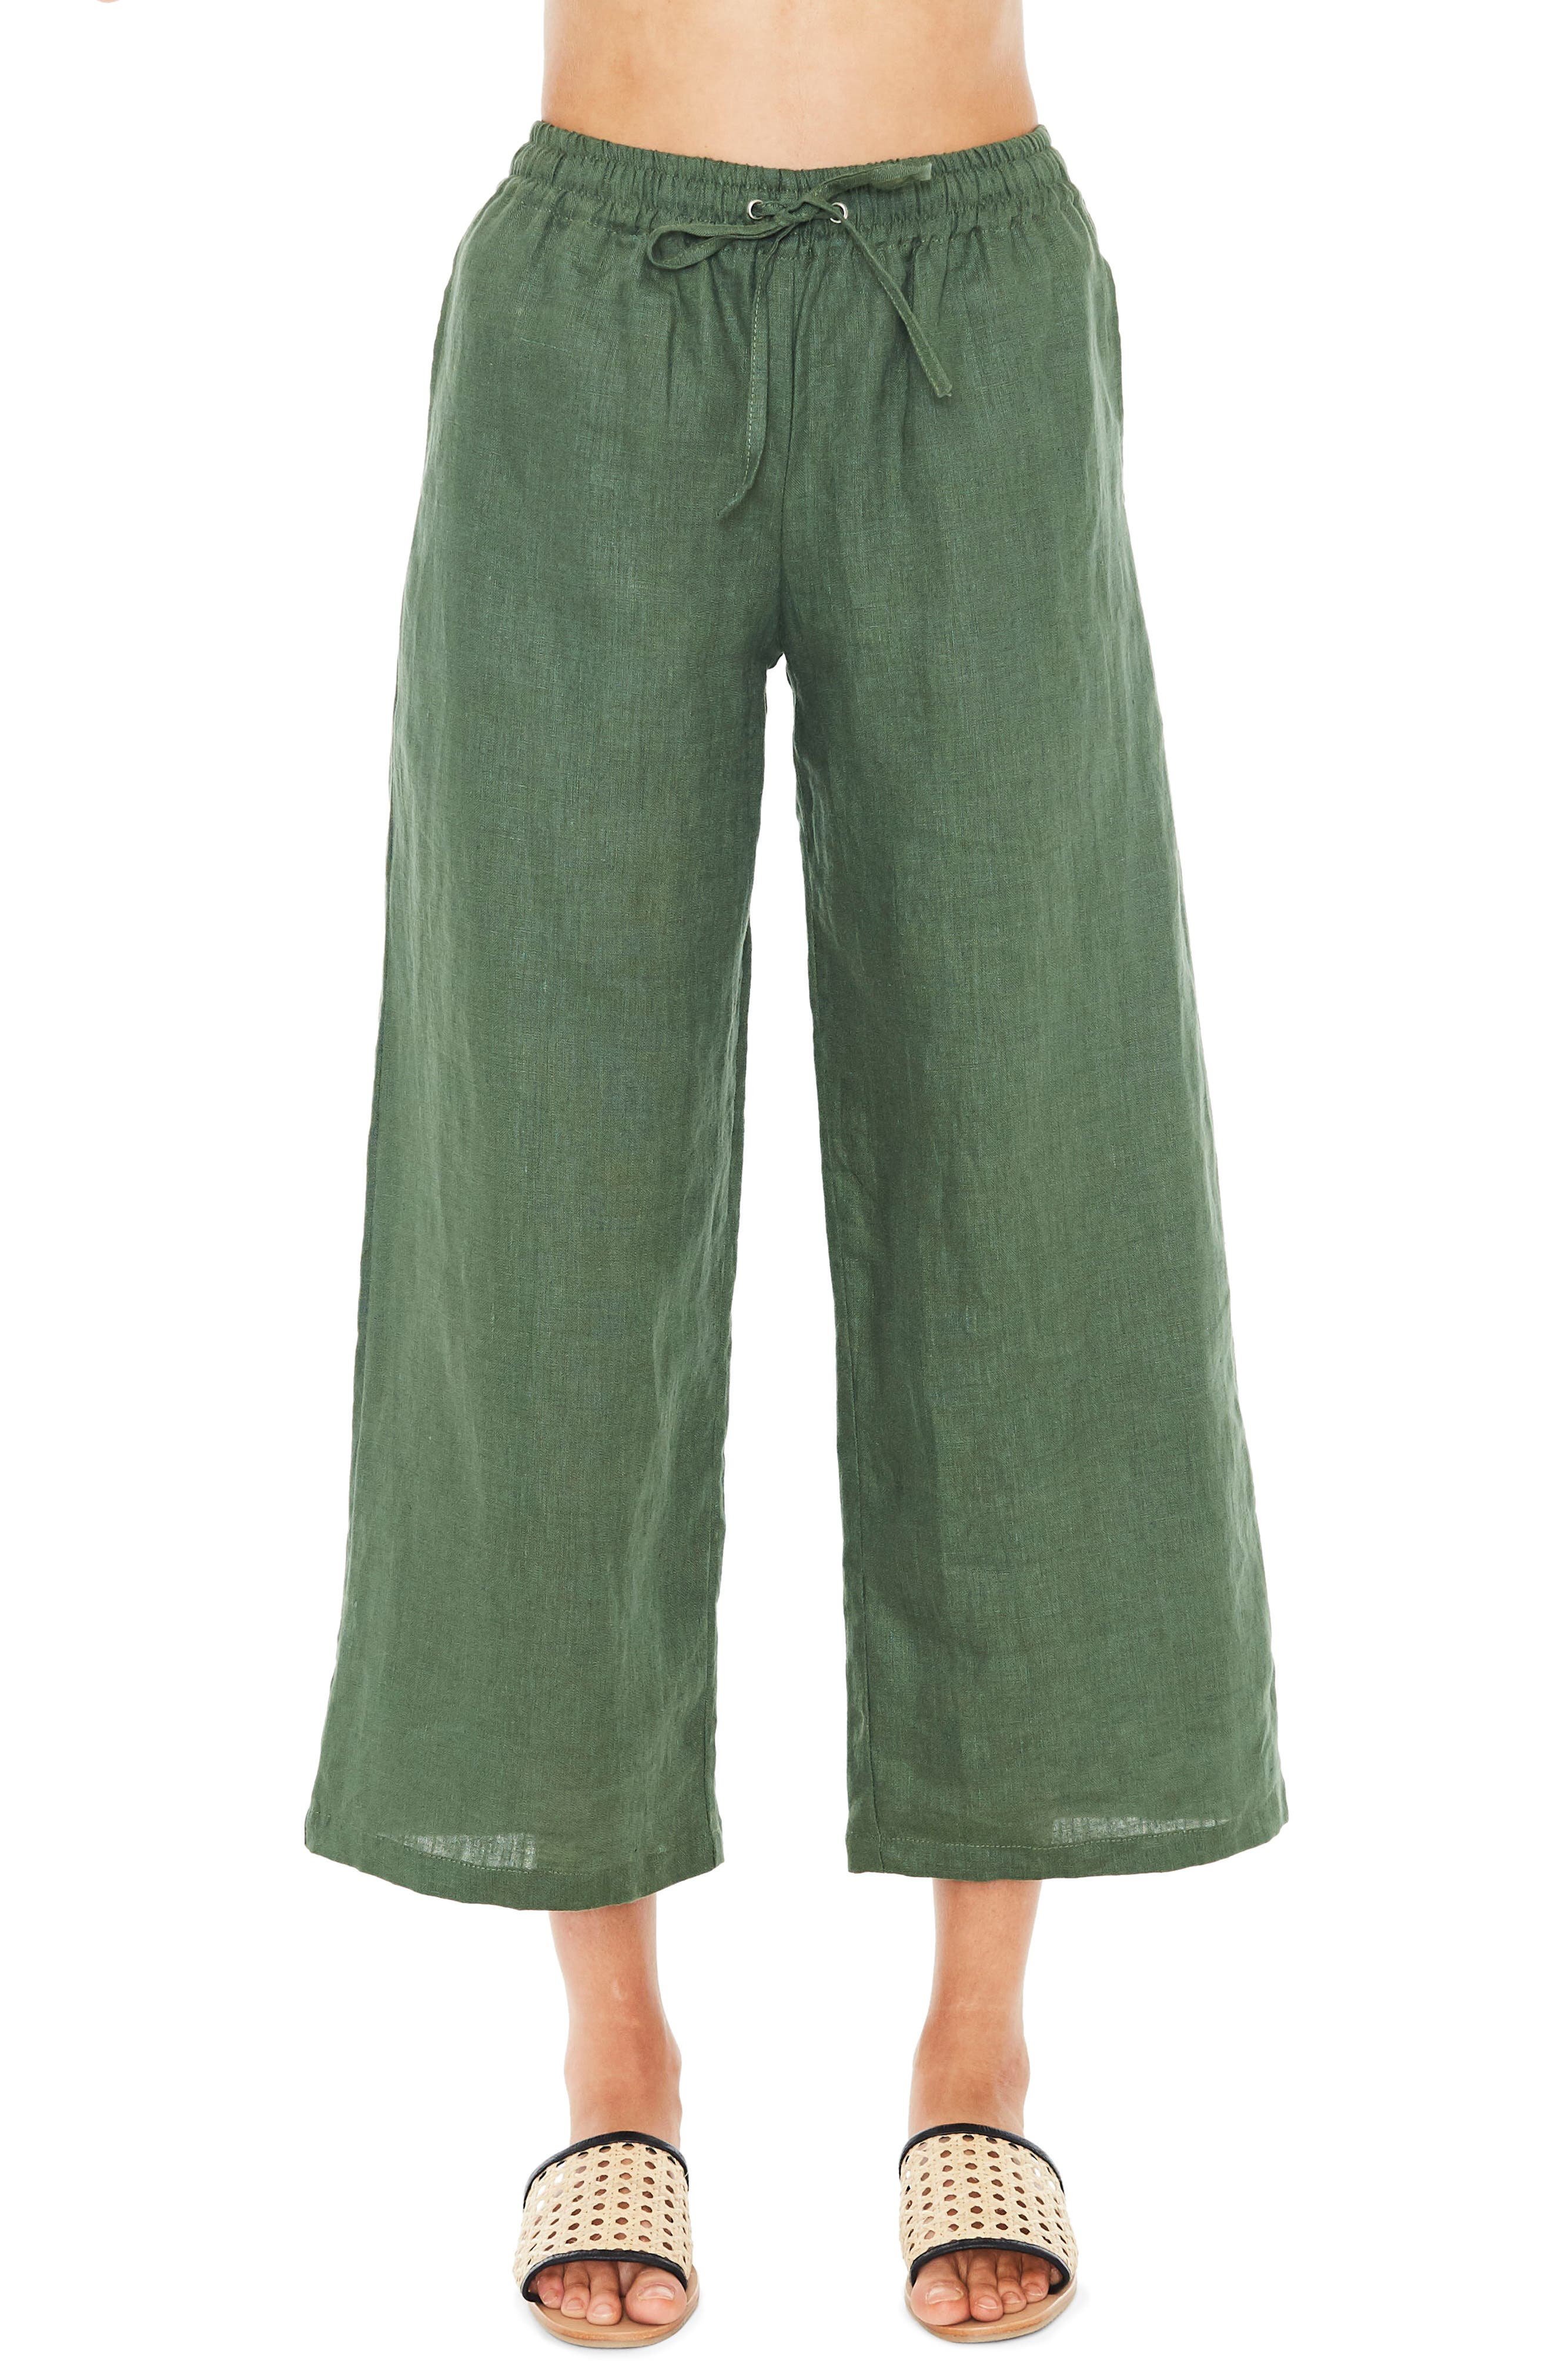 Clemence Linen Pants,                         Main,                         color, PLAIN MOSS GREEN